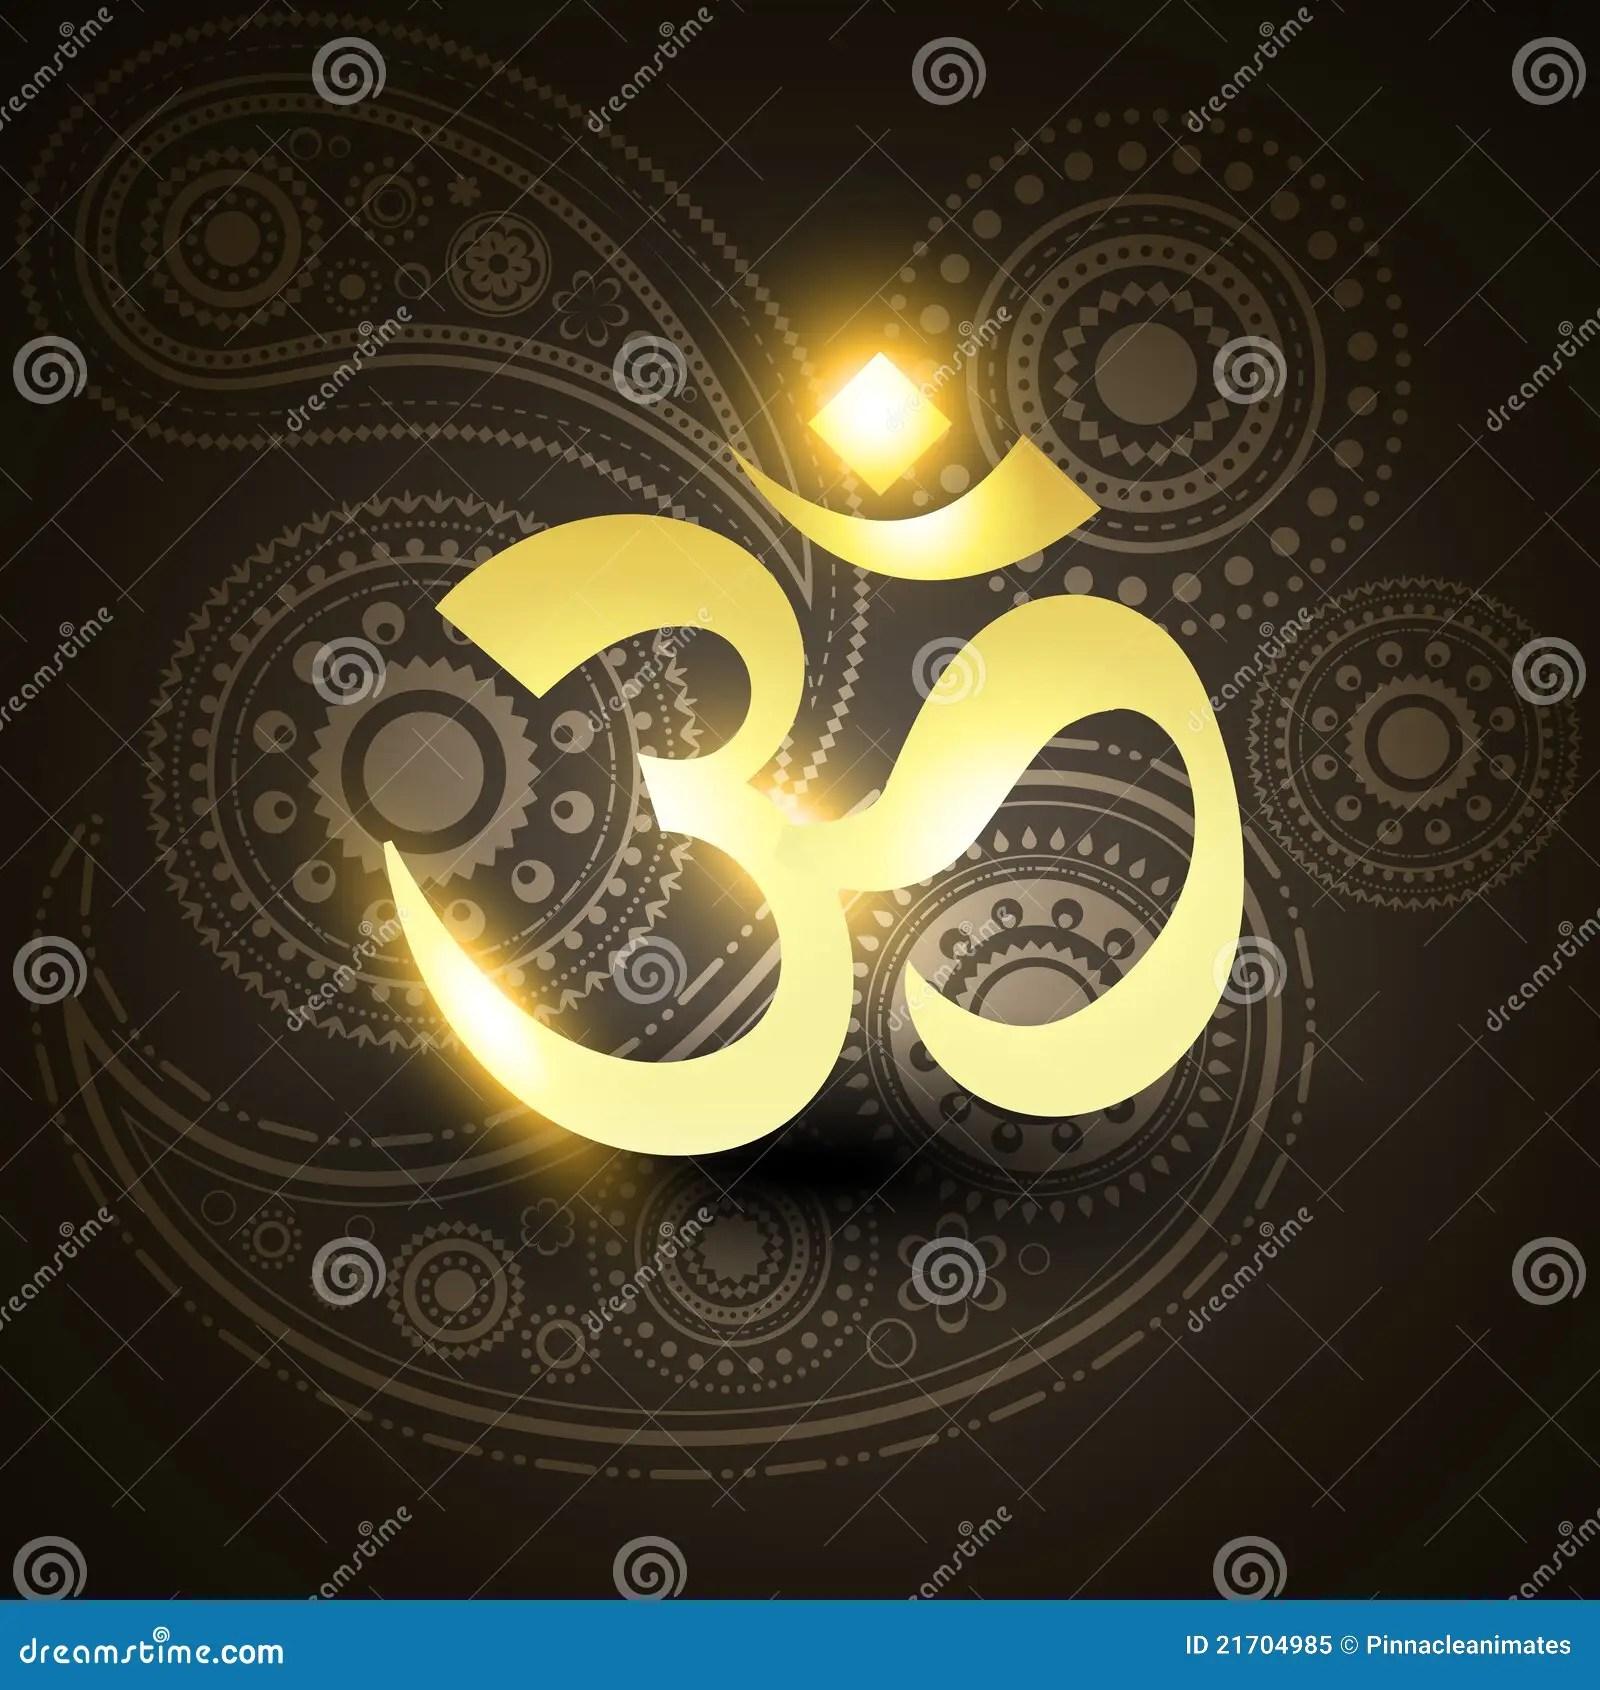 India Wallpaper 3d Beautiful Golden Om Symbol Stock Image Image 21704985